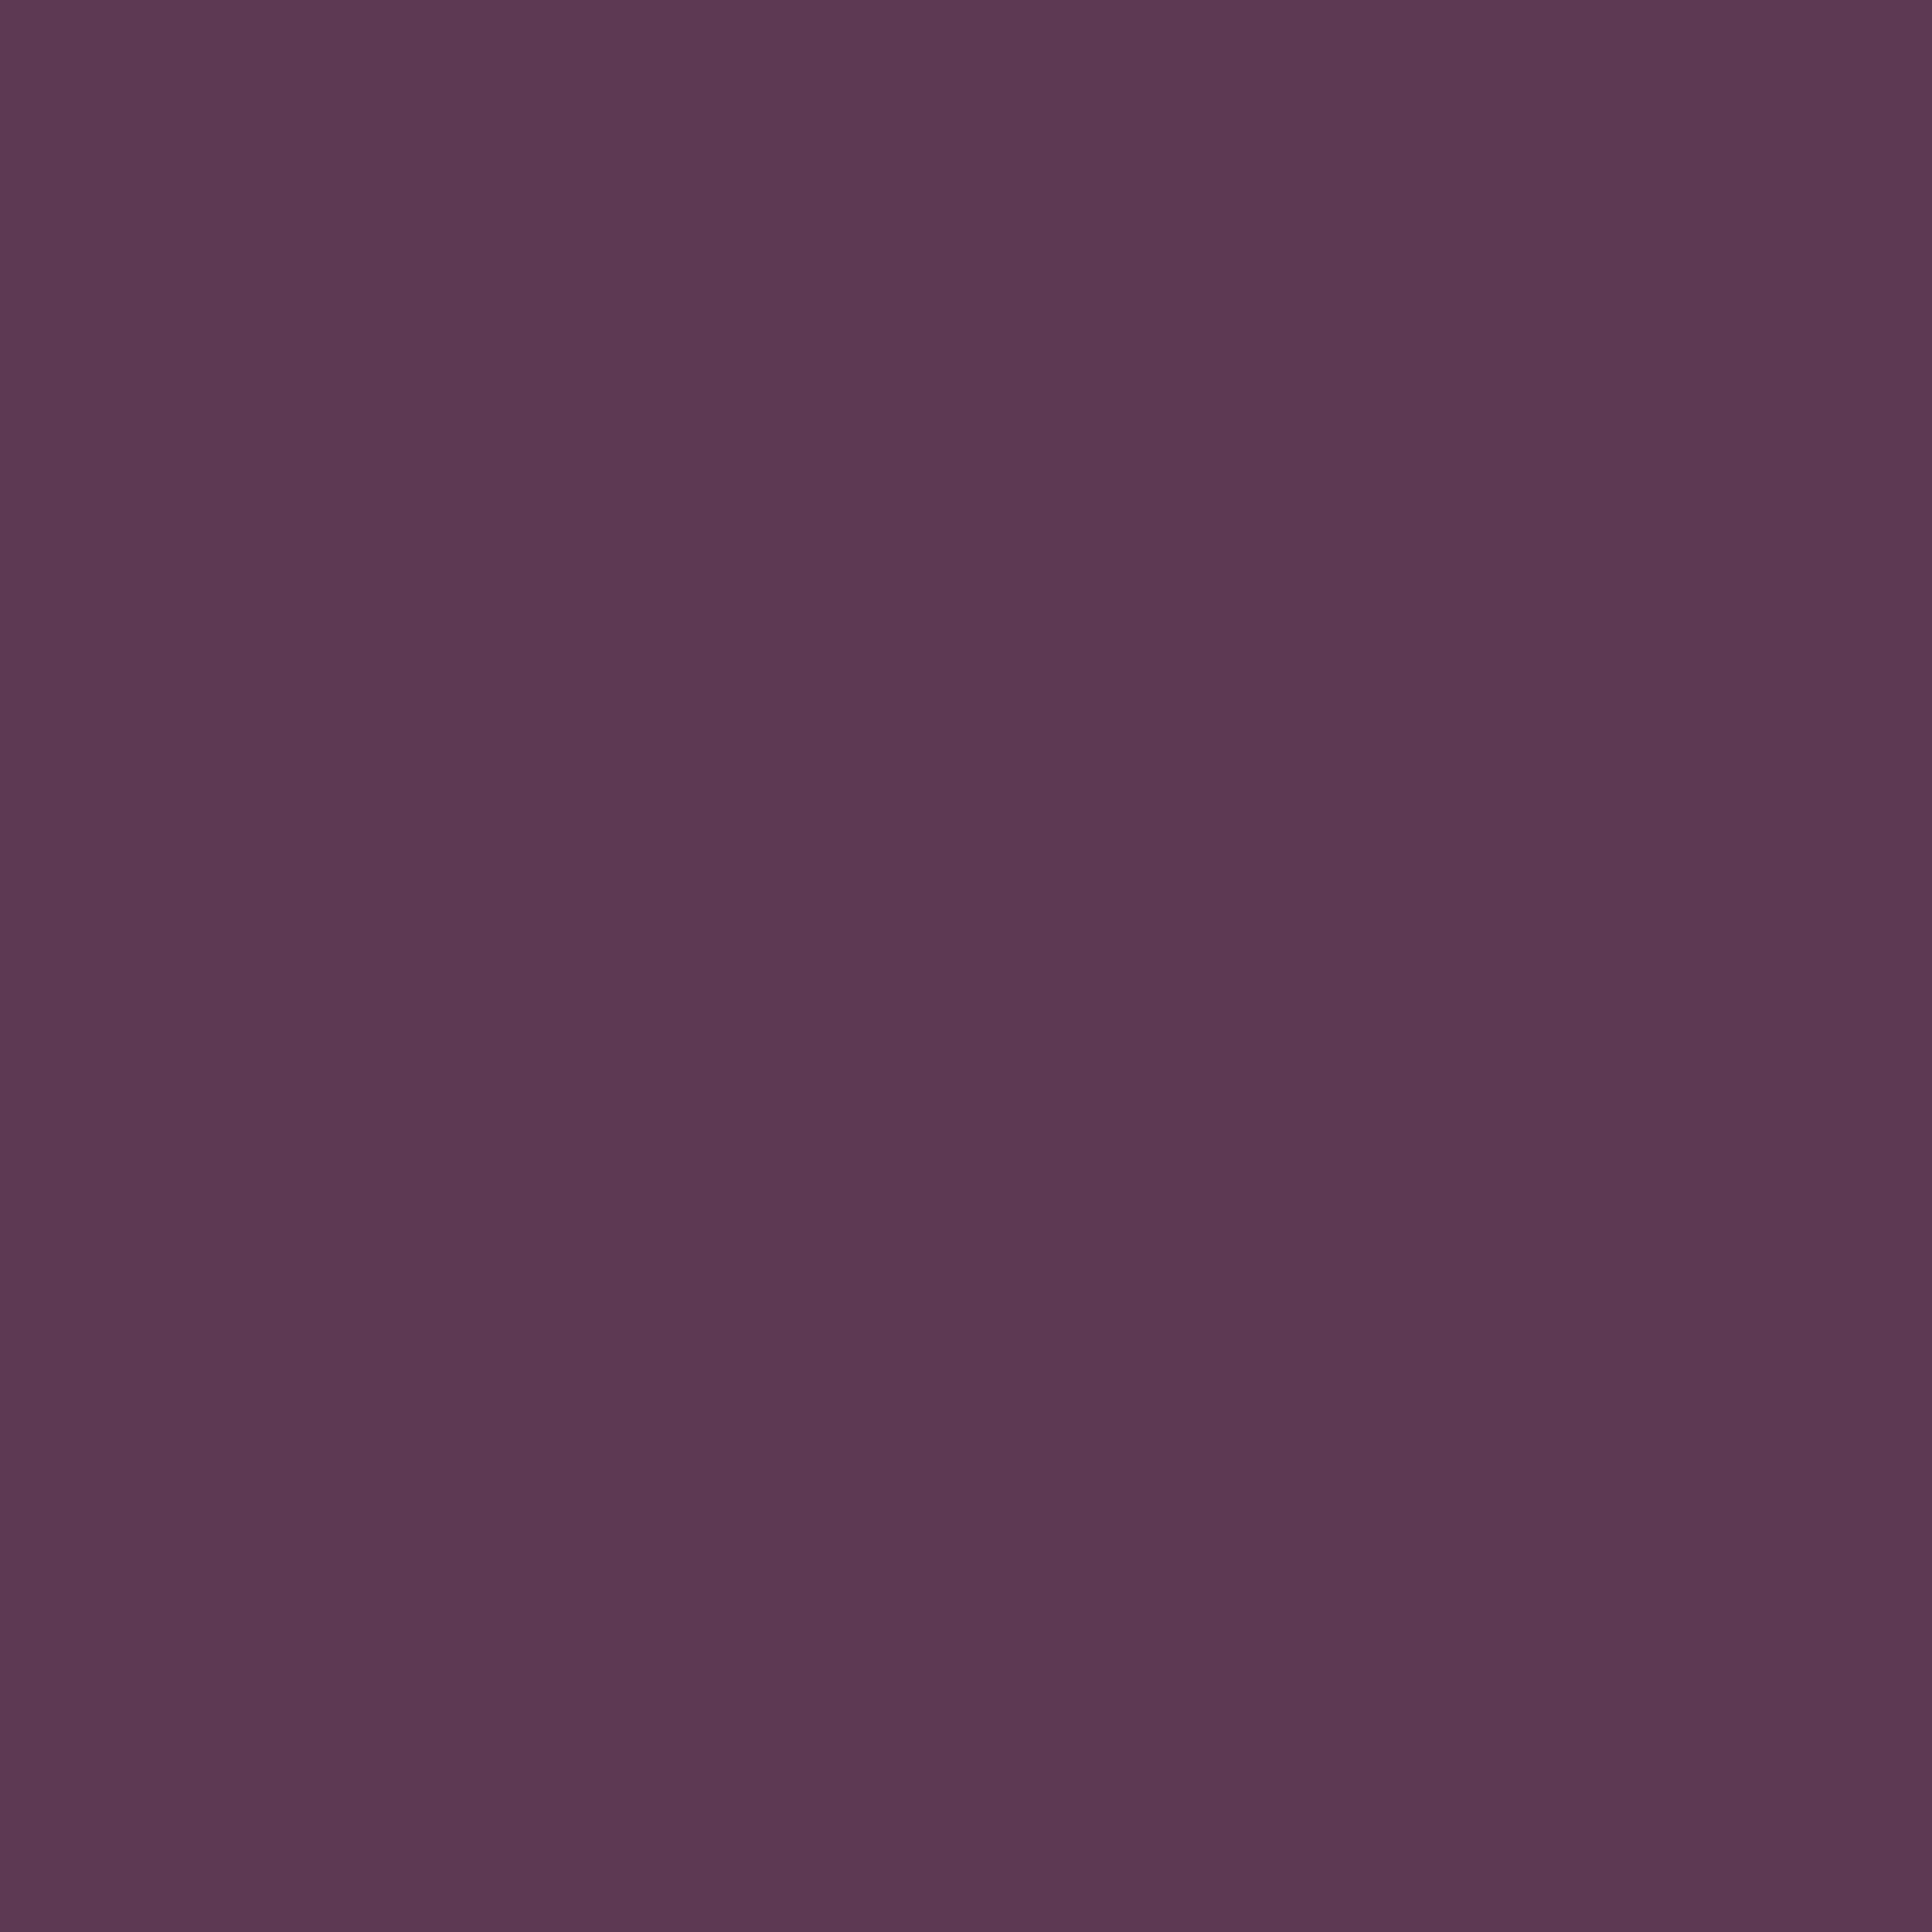 2048x2048 Dark Byzantium Solid Color Background